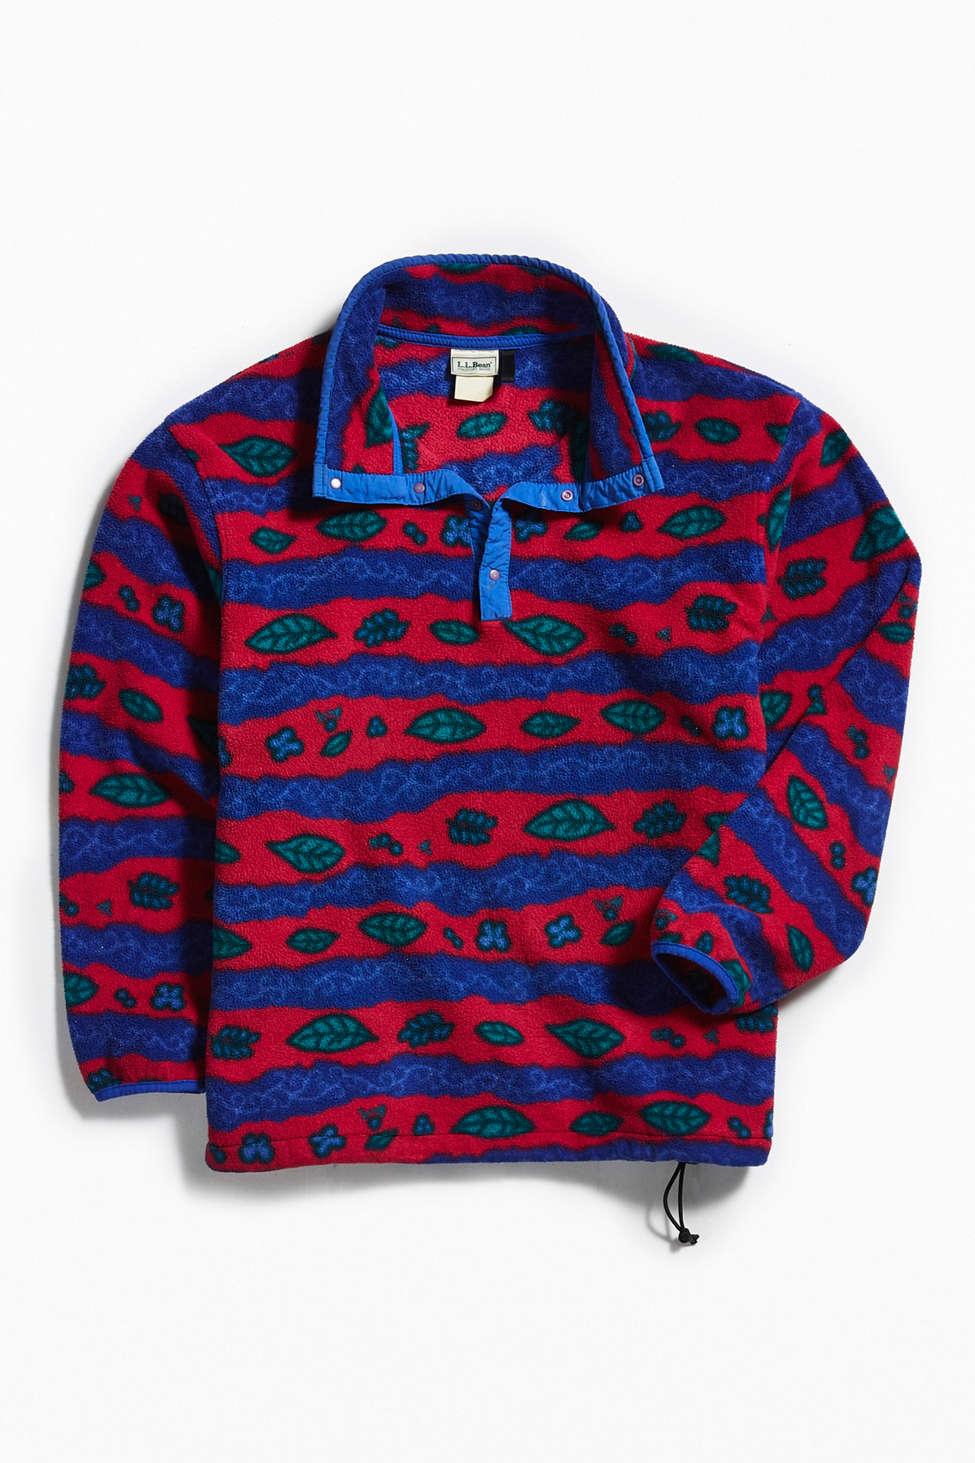 Vintage Ll Bean Red Multi Polar Fleece Jacket Urban Outfitters